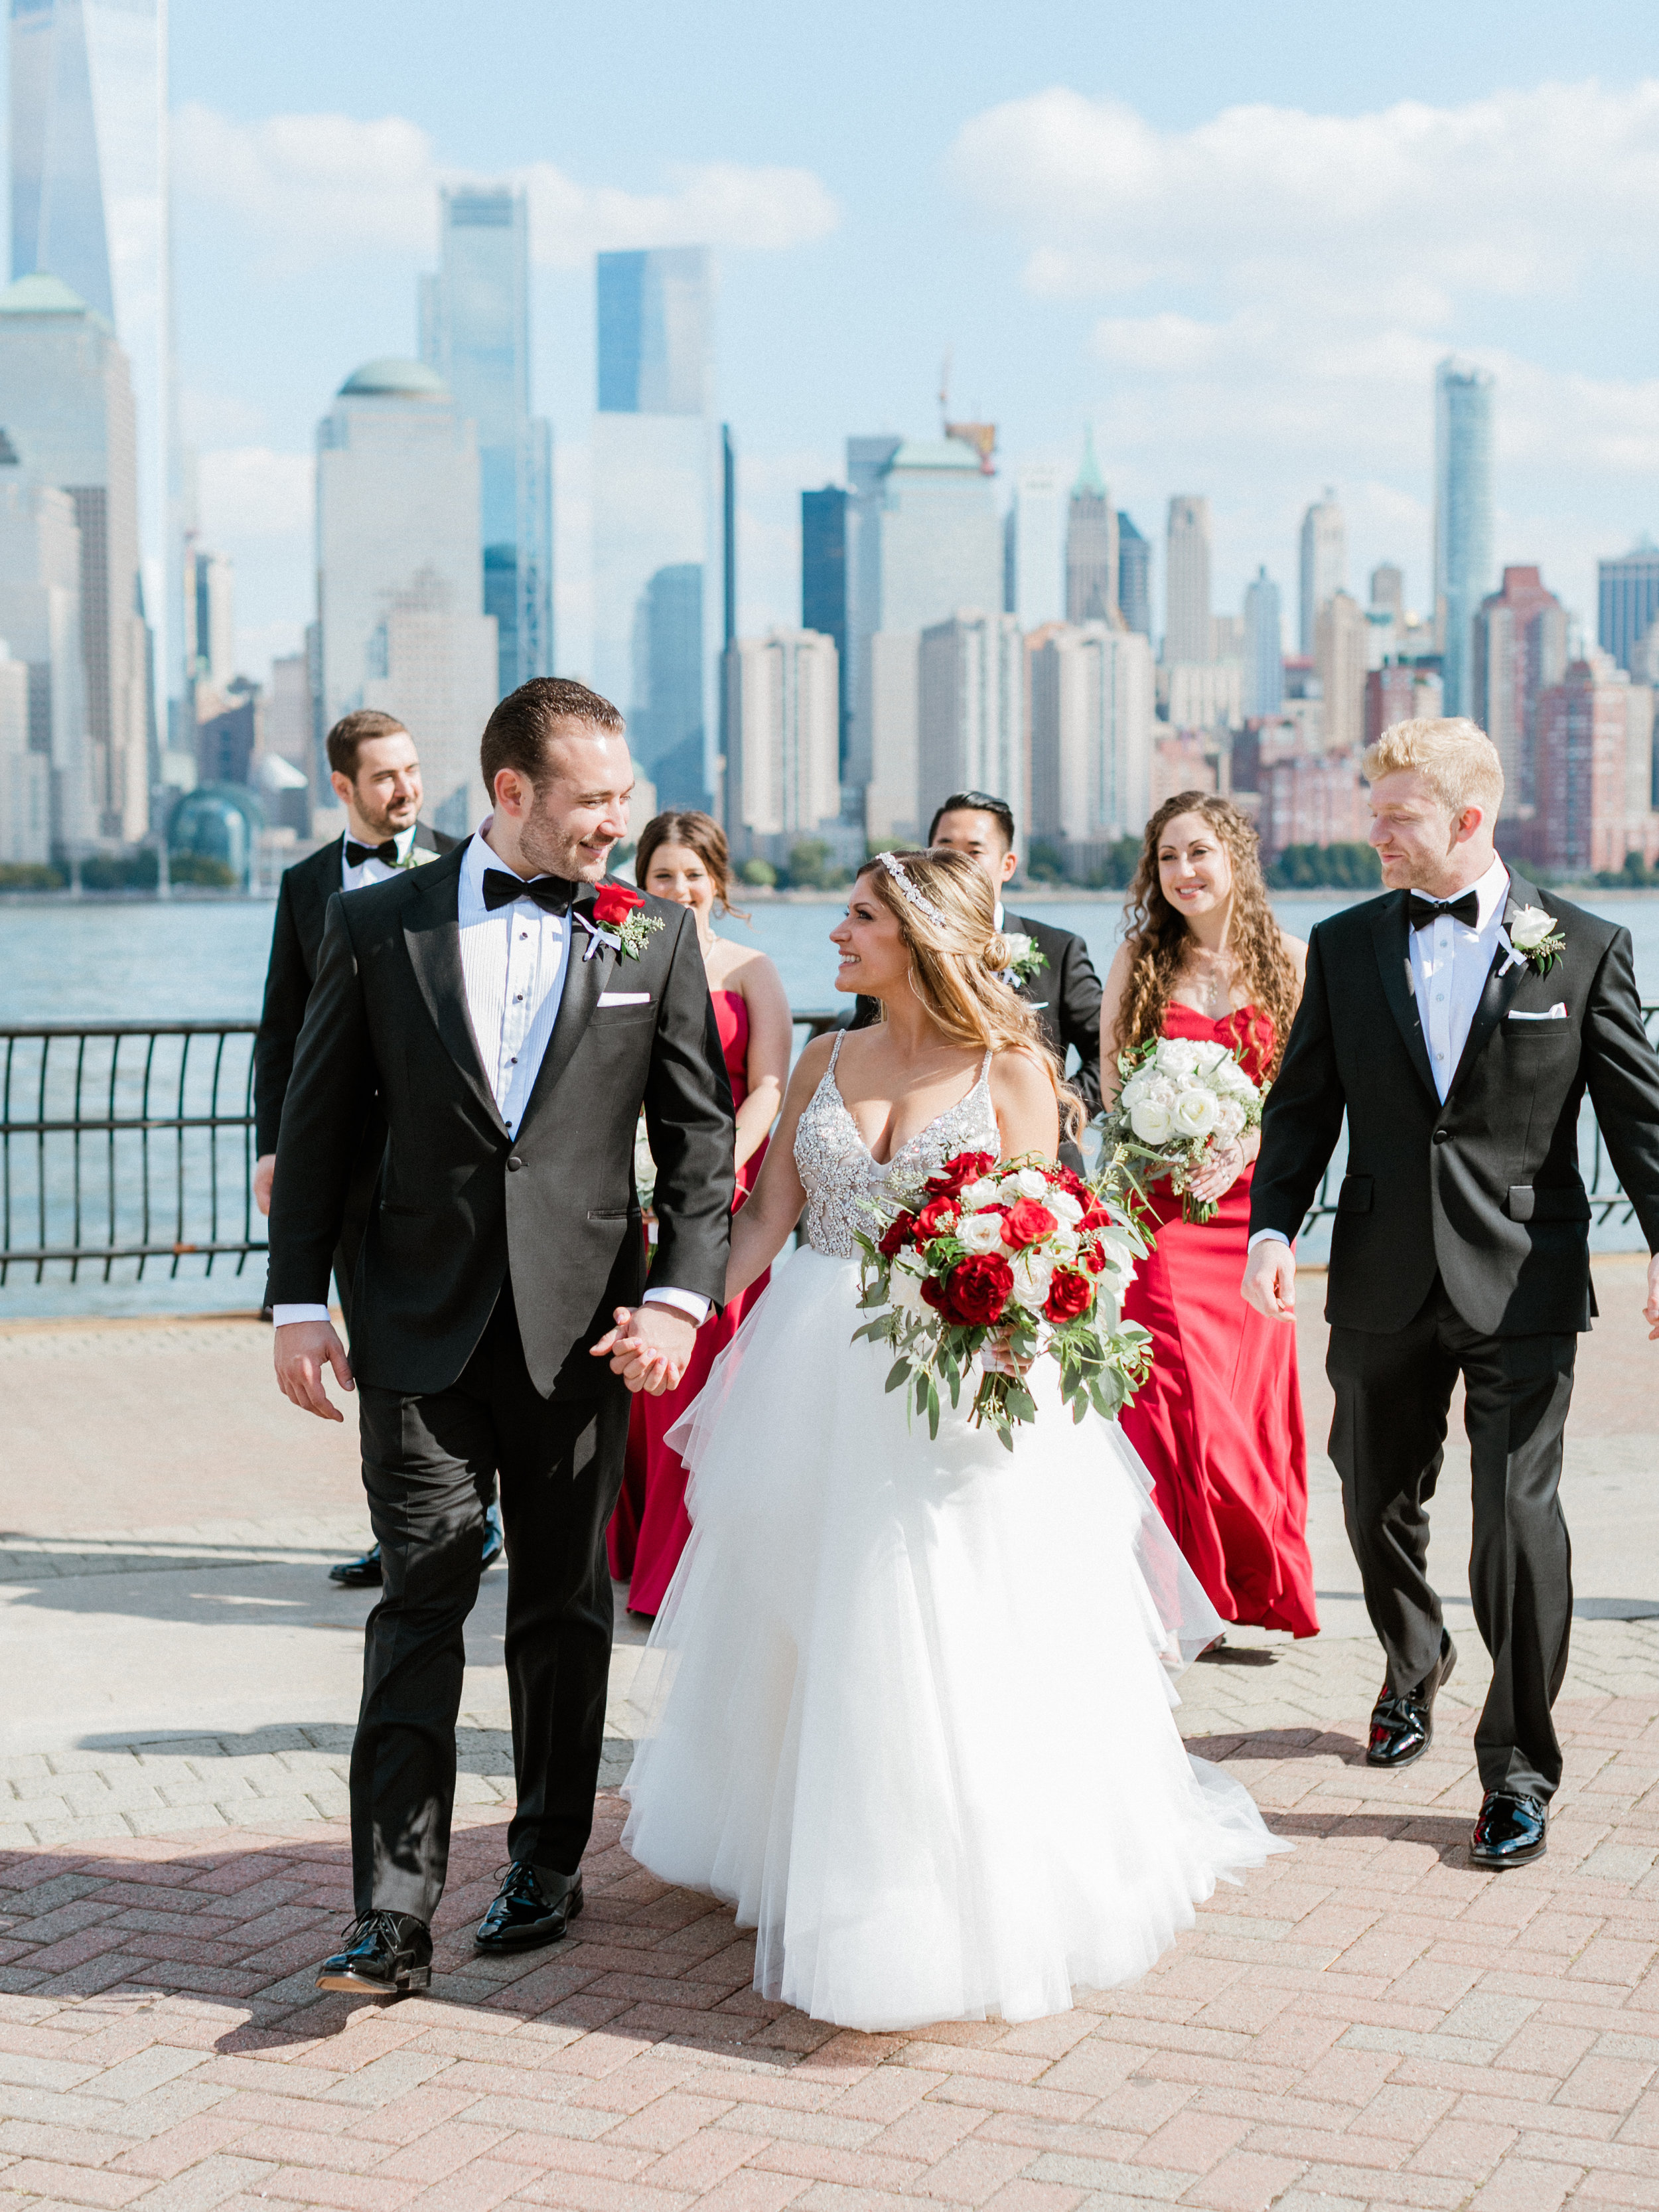 hyatt-regency-jersey-city-wedding-photographer30.jpg